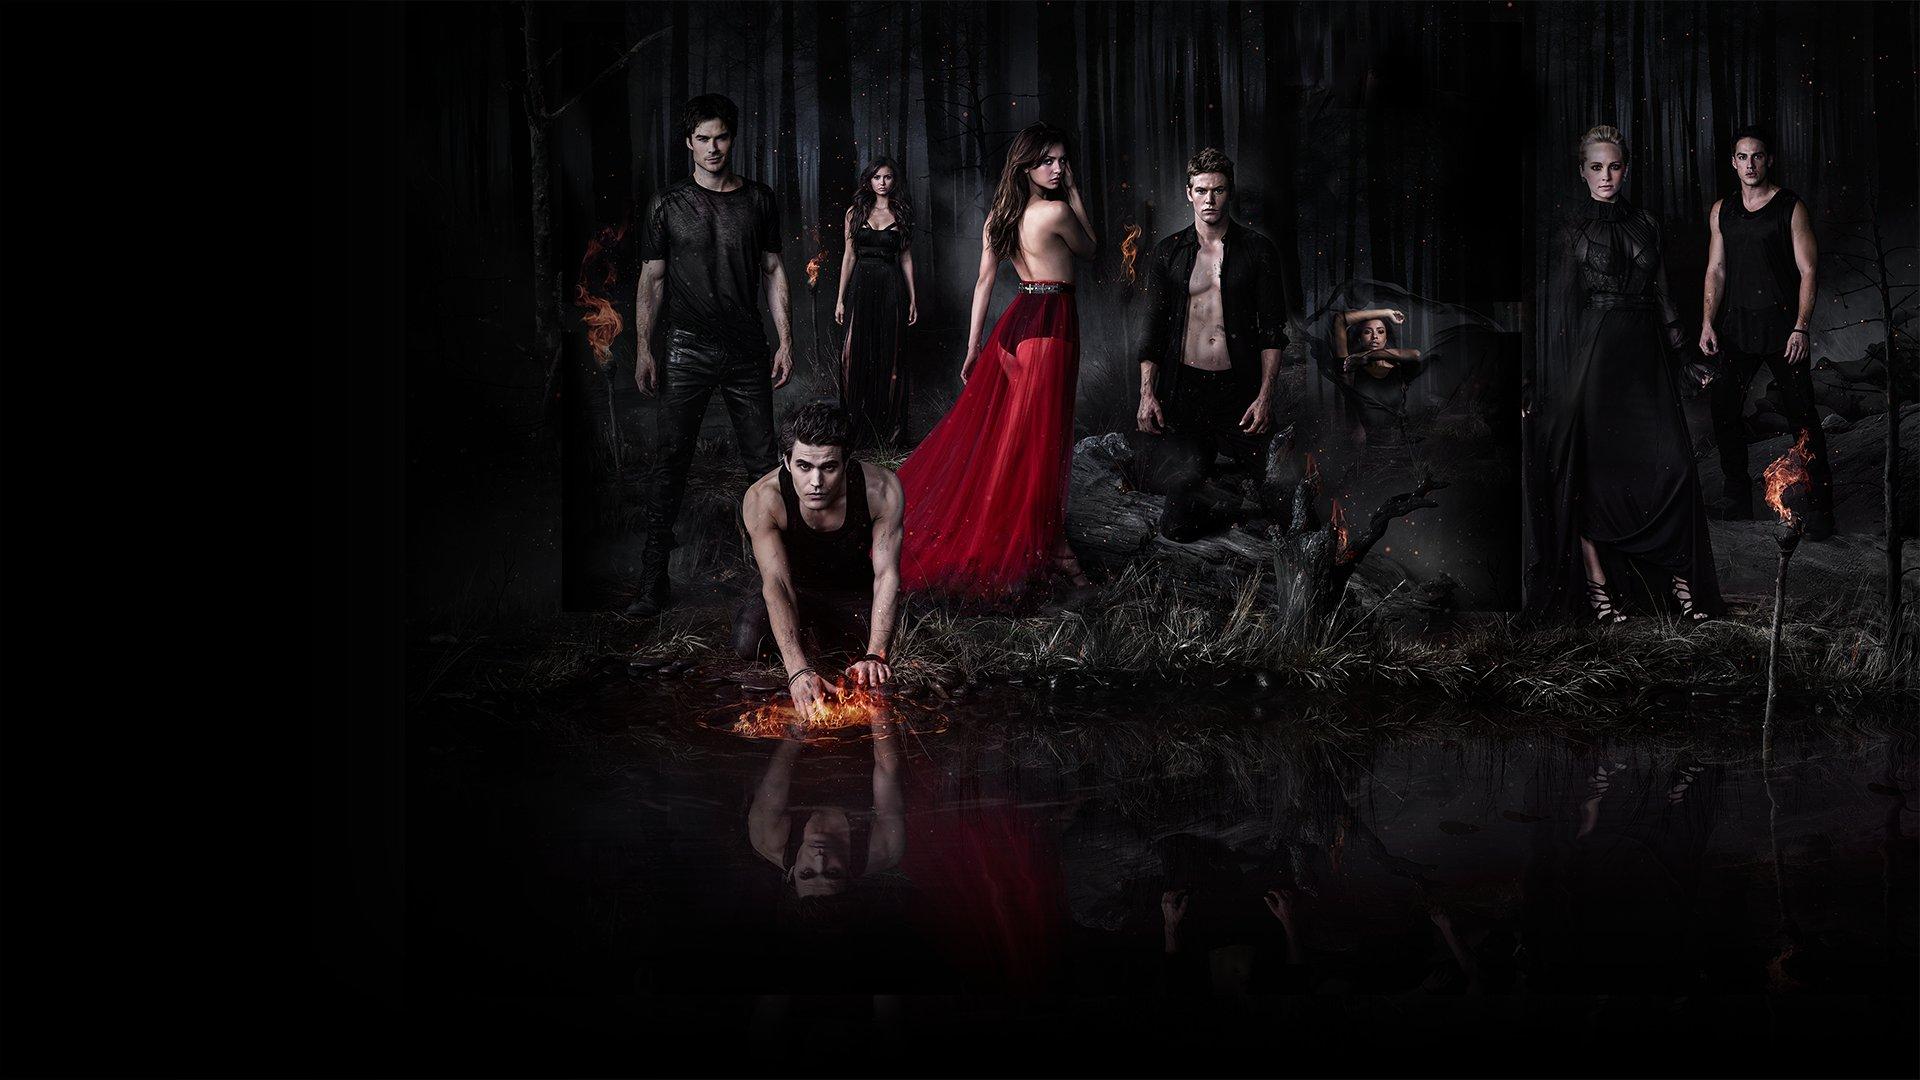 fond Vampire Diaries : Michael Malarkey (Enzo) plus team Stefan ou team Damon ?